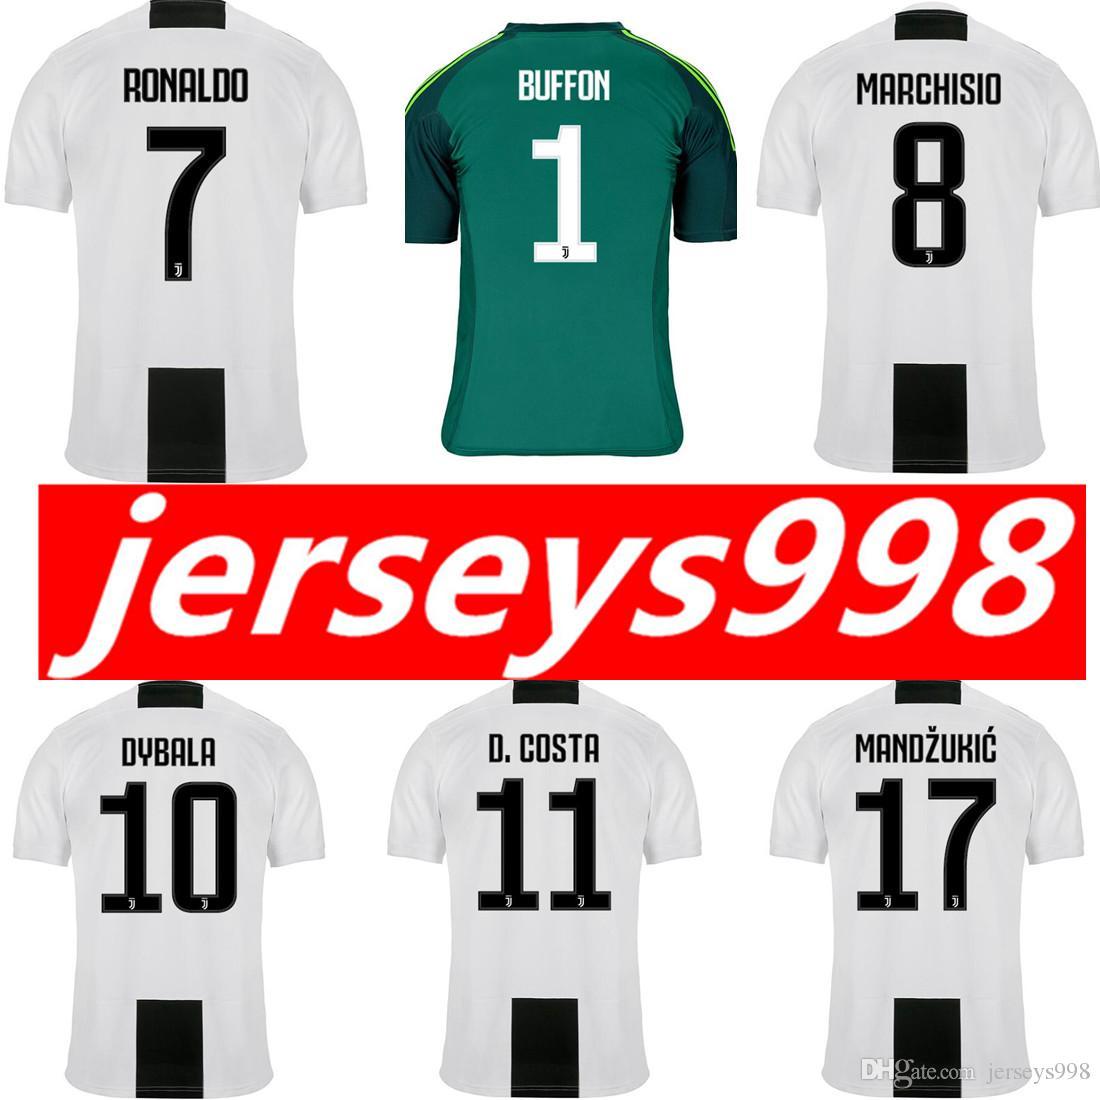 newest 204c0 6132a 18 19 RONALDO Dybala JUVENTUS Soccer Jersey MAGLIA Calcio HIGUAIN Black  Goalkeeper Buffon D.Costa MANDZUKIC Matuidi Football Shirts Maillot